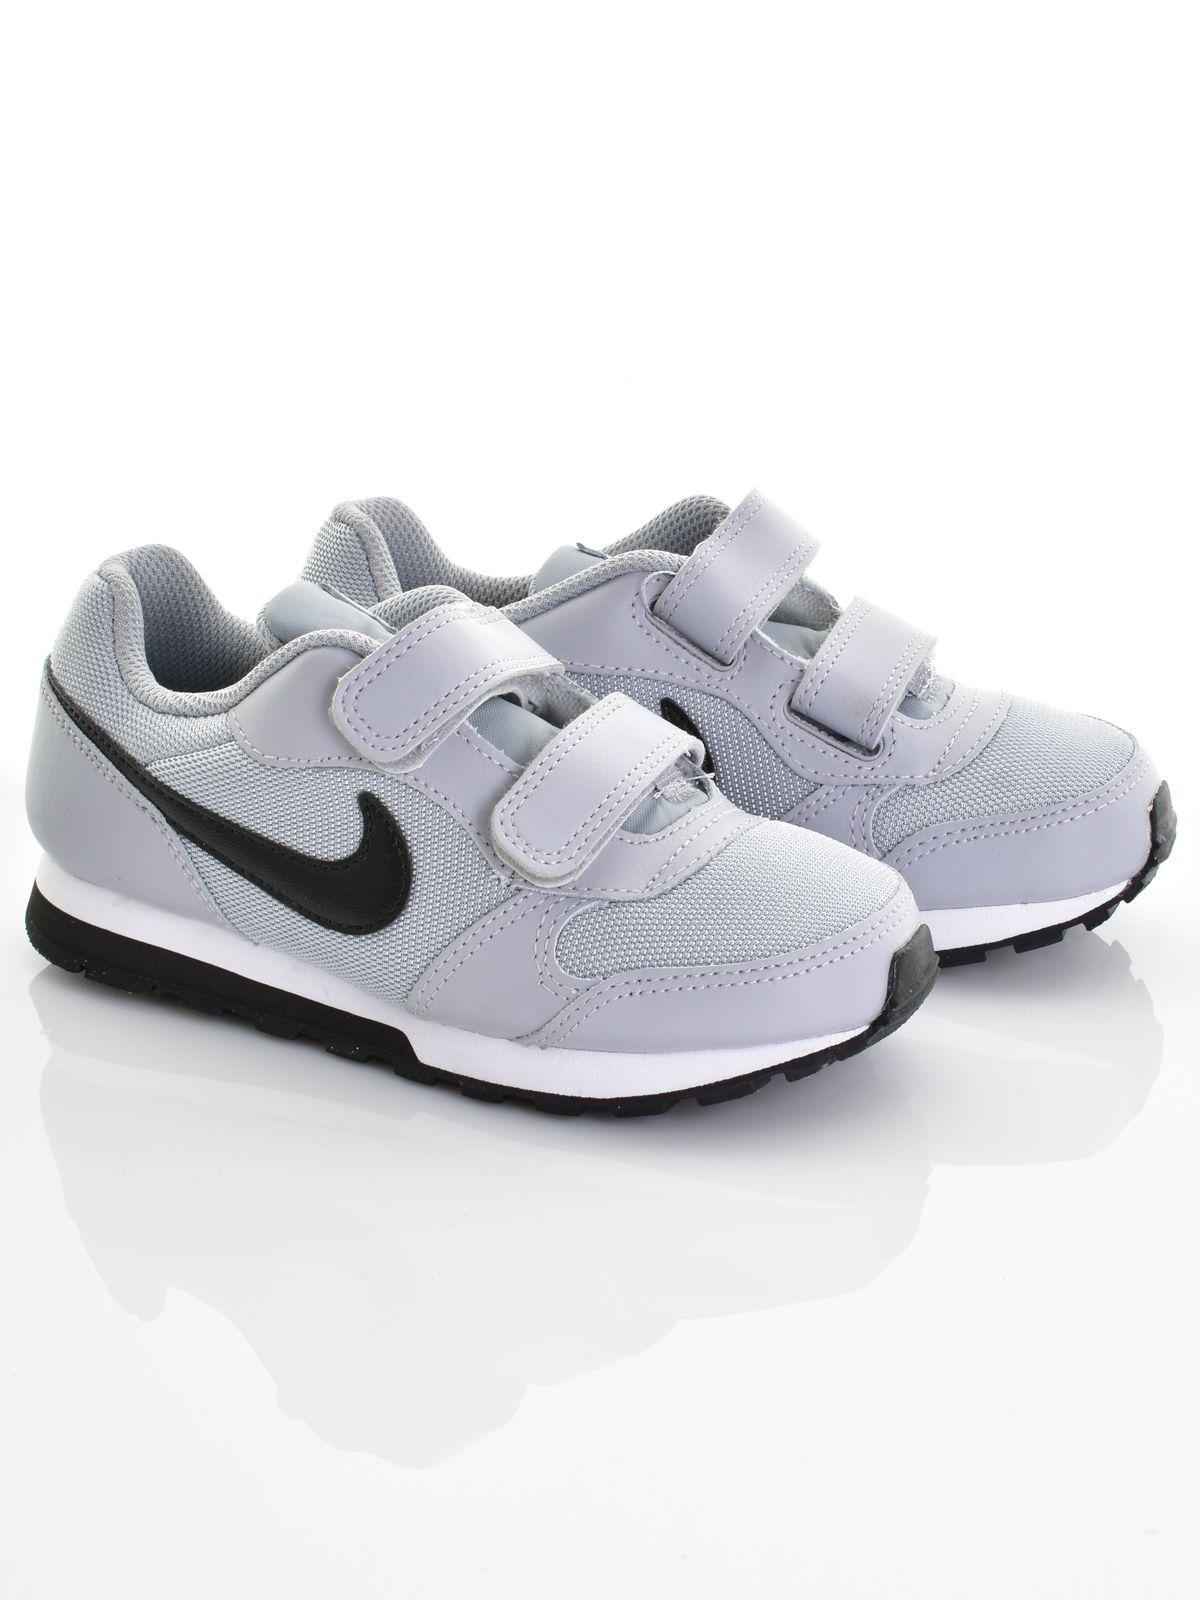 ... Nike fiú cipő MD Runner 2 (PS) Pre-School Shoe ec990e5d9c